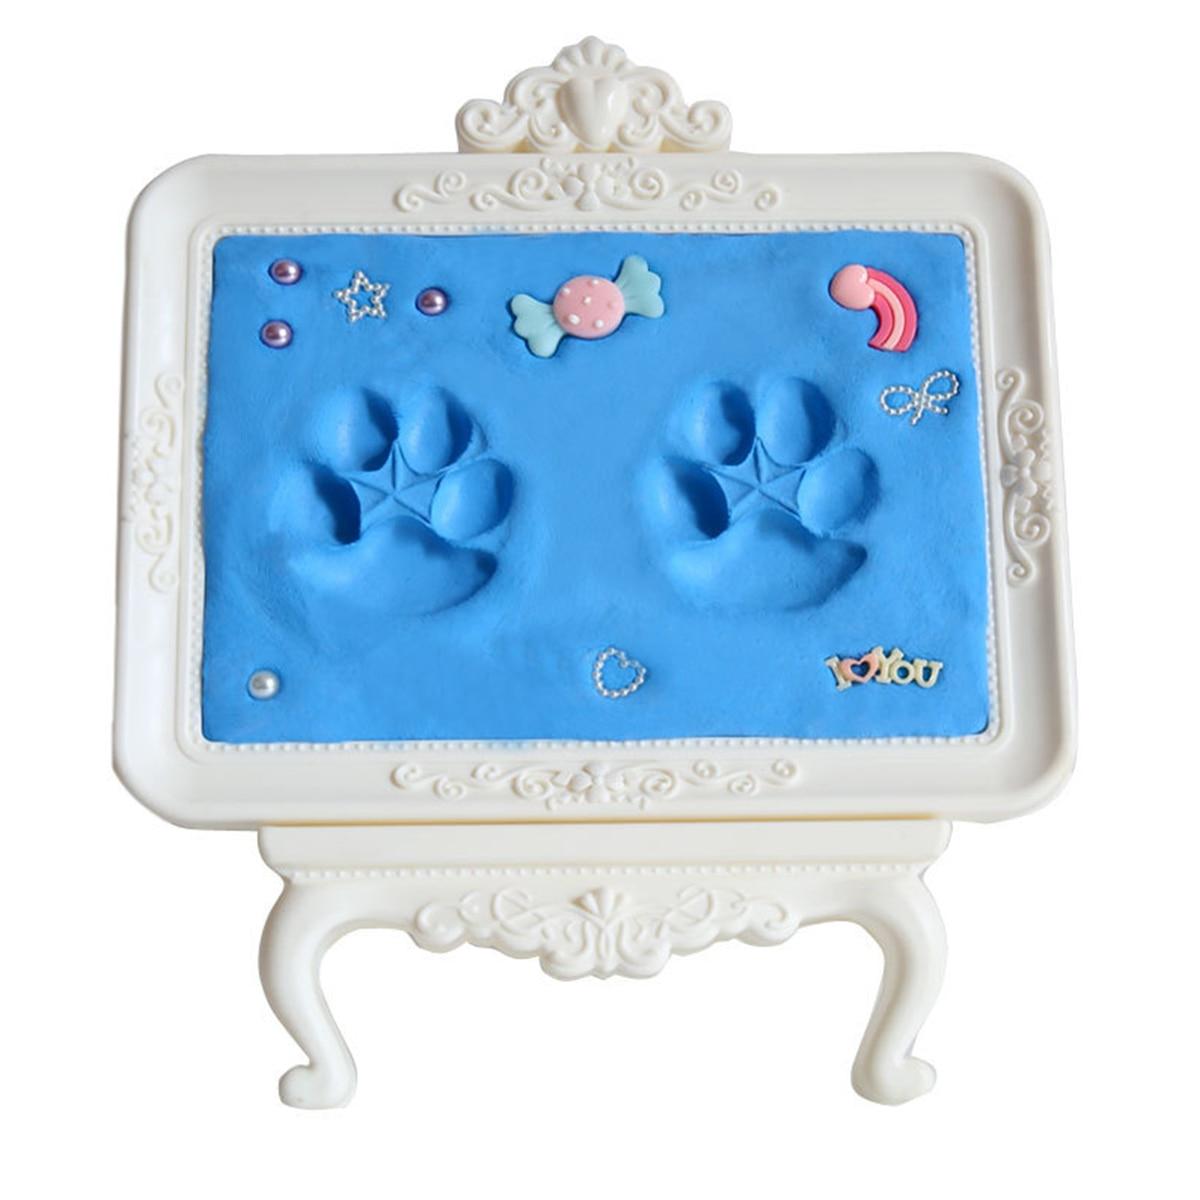 Safe Newborn Baby Souvenirs Hand Foot Print Baby Handprint Footprint Mud Maker Keepsake Soft Clay Baby items for newboms Gift